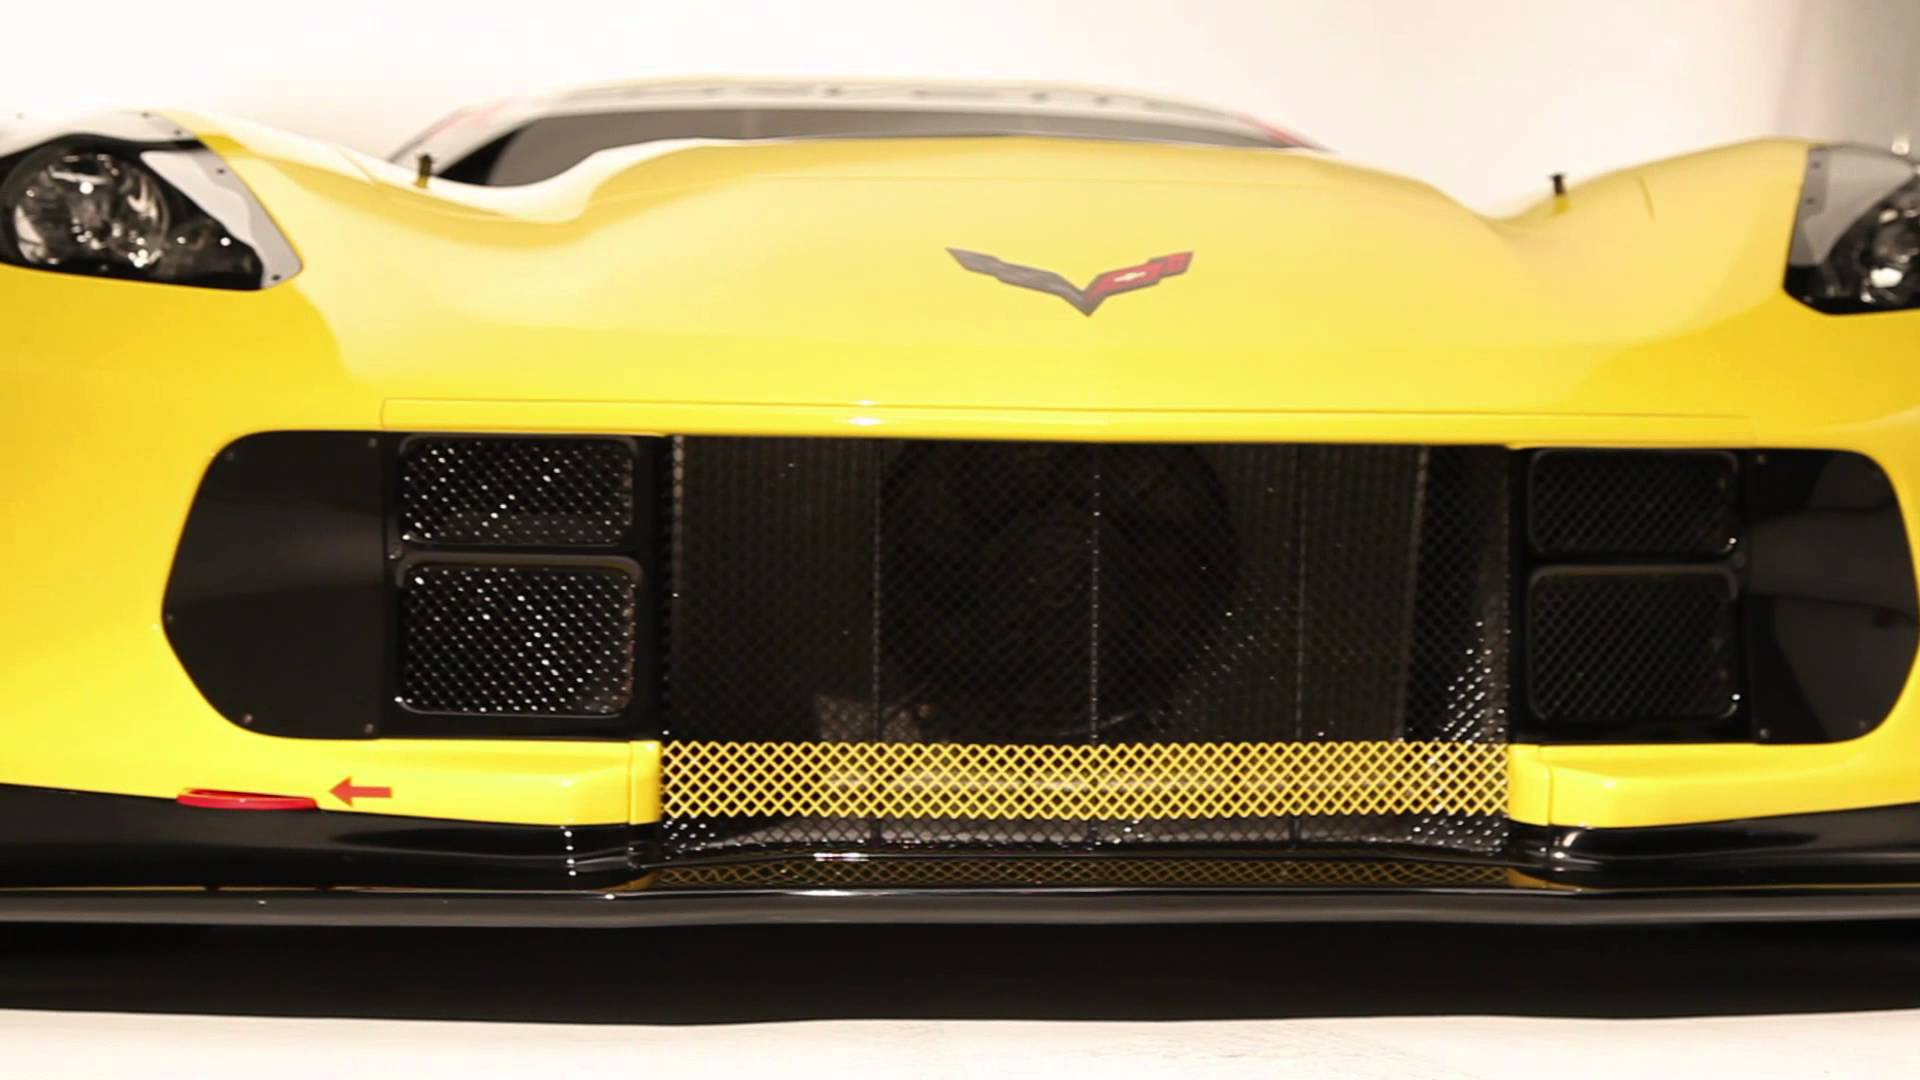 2014 Corvette C7.R Racecar — Walkaround | Chevrolet